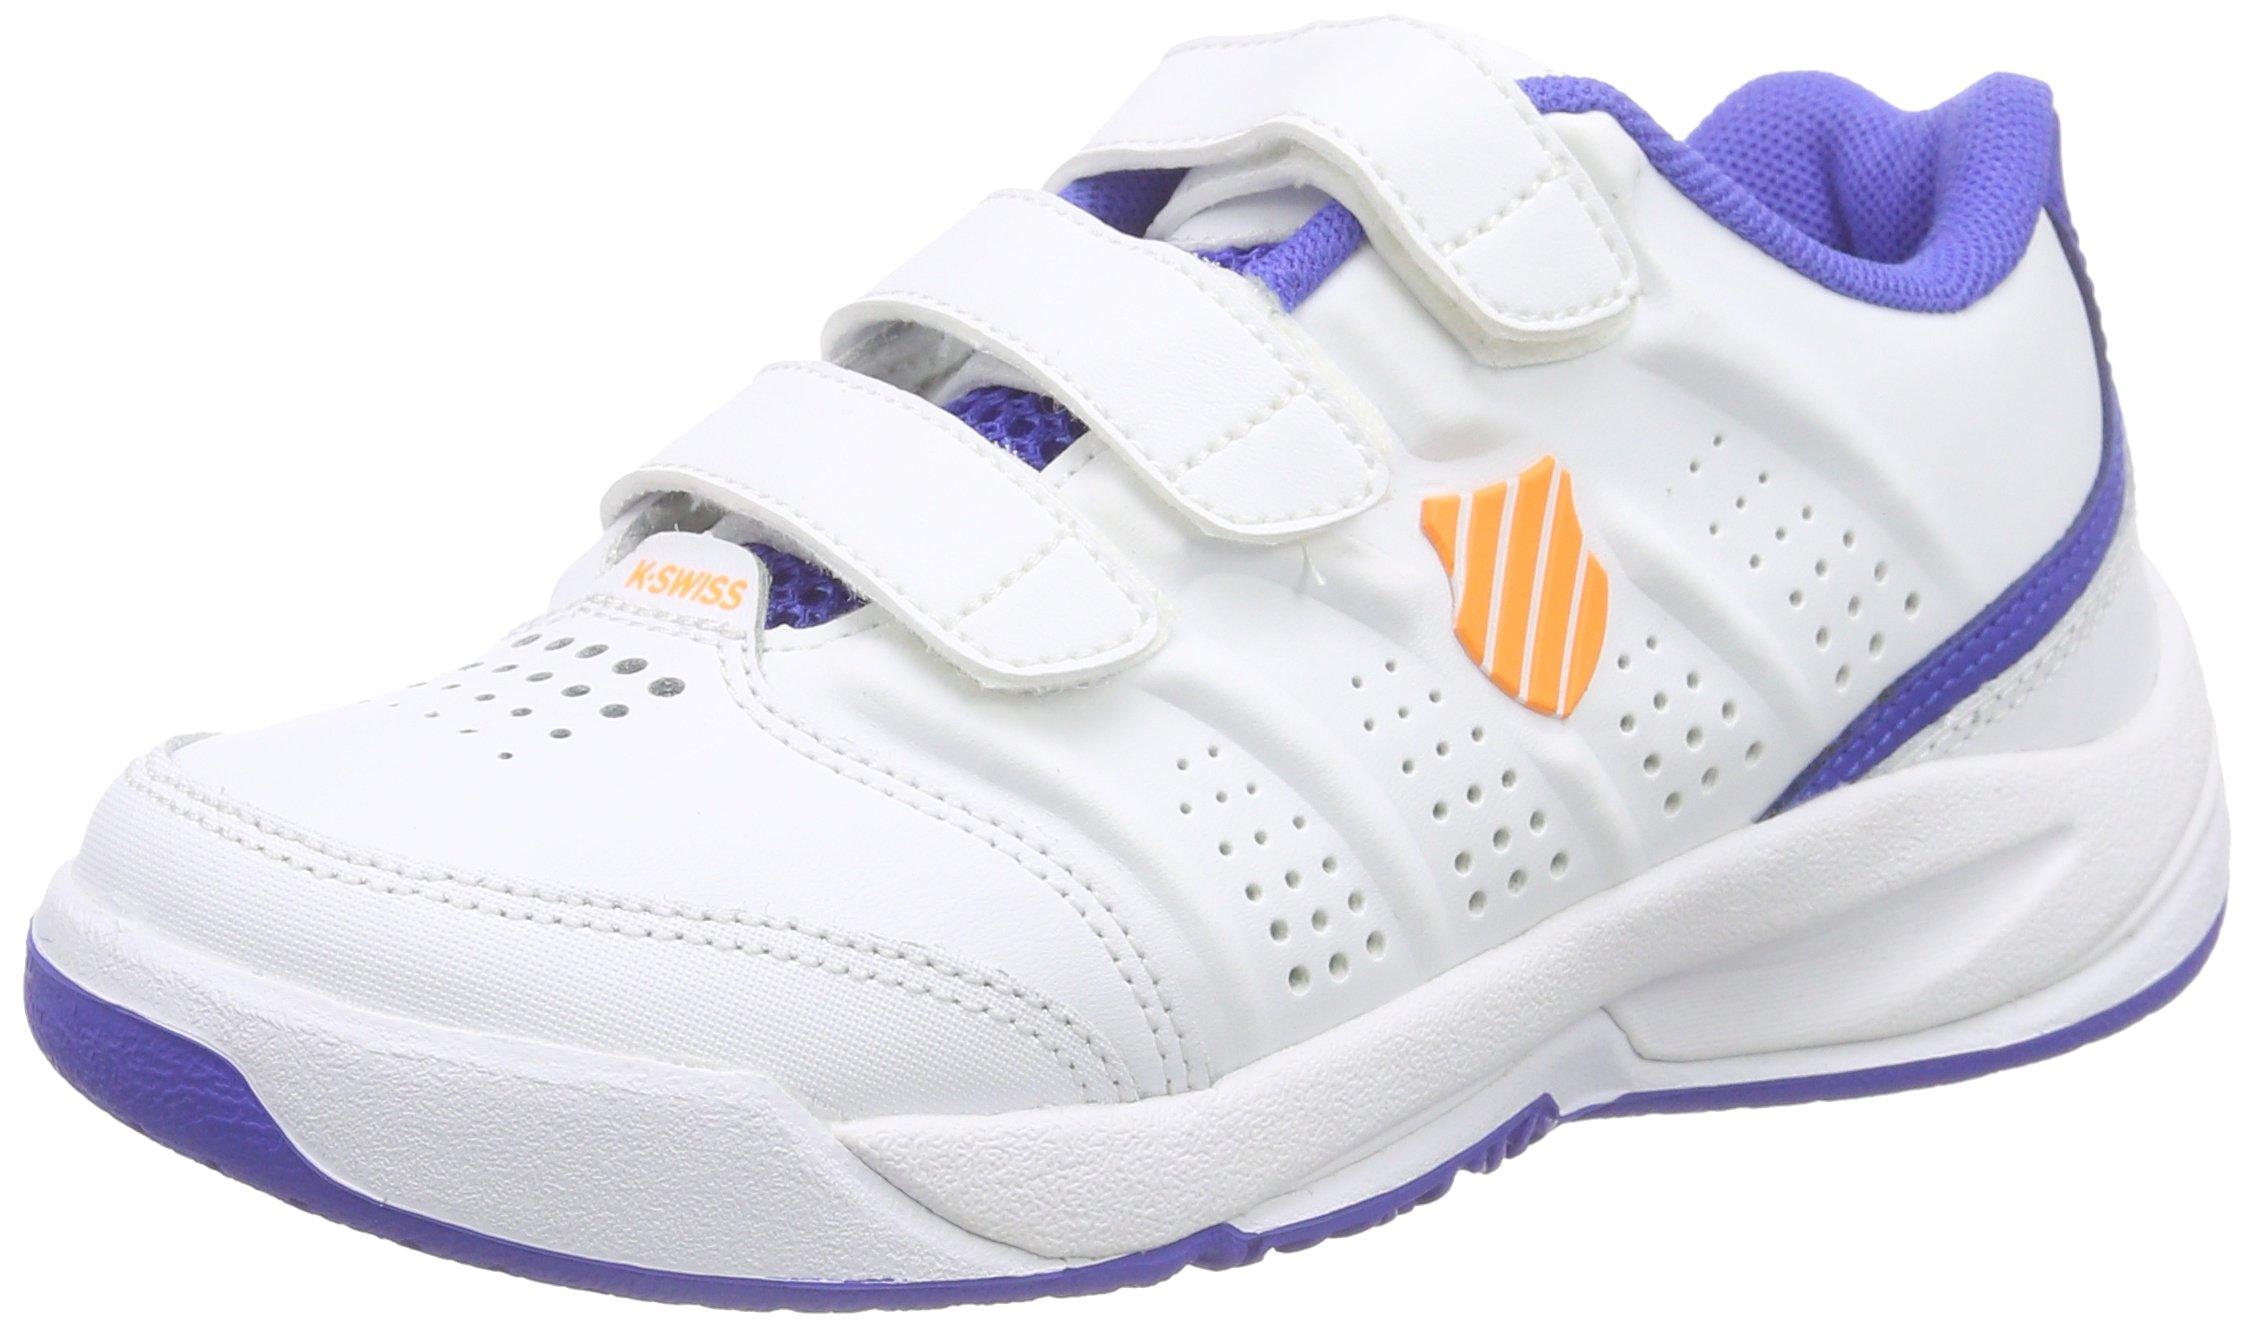 K-Swiss Ultrascendor Omni Junior Tennis Shoes, White/Blue, J12